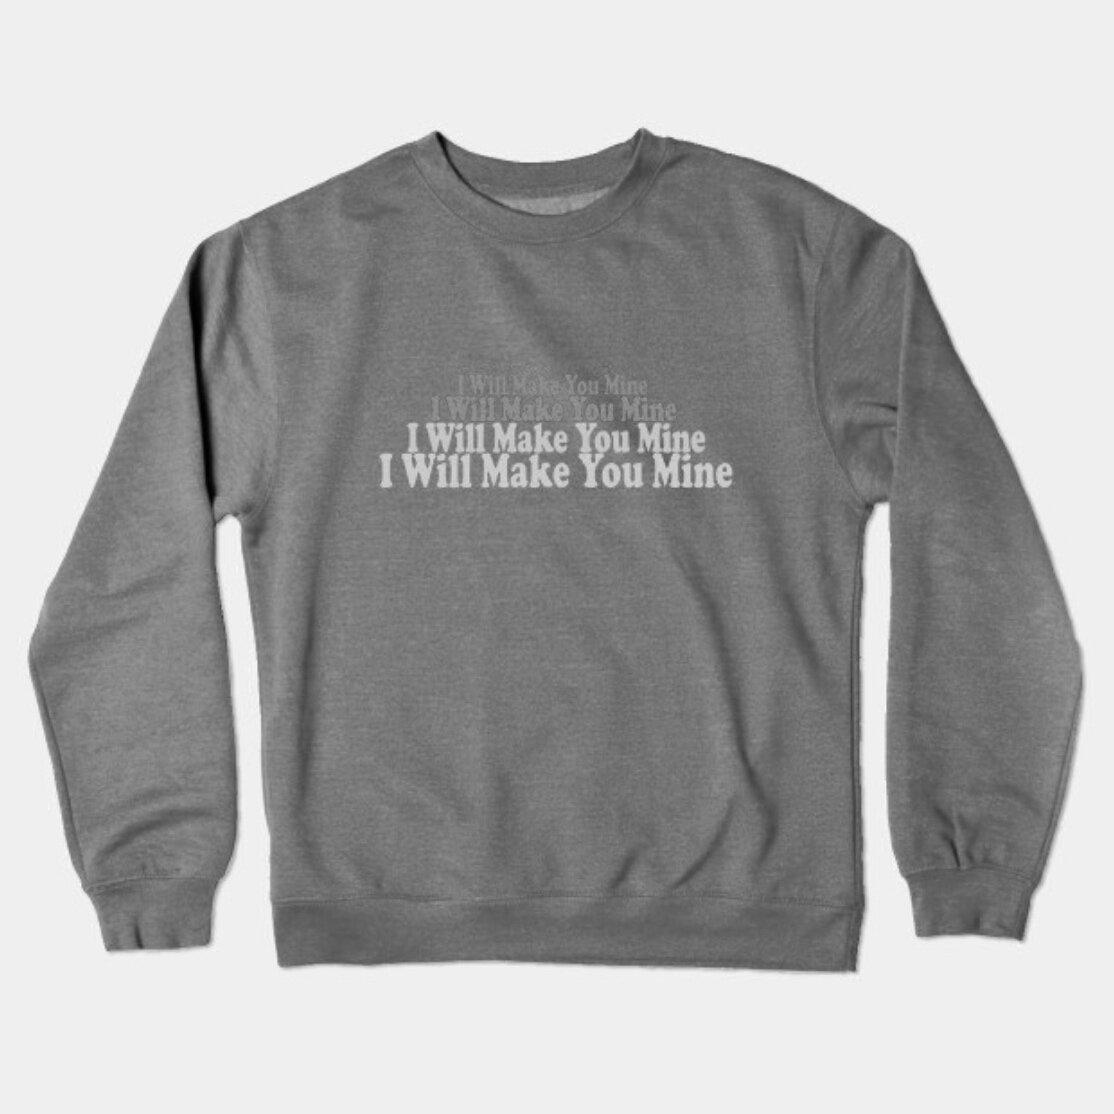 IWMYM%2Bsweatshirt.jpg